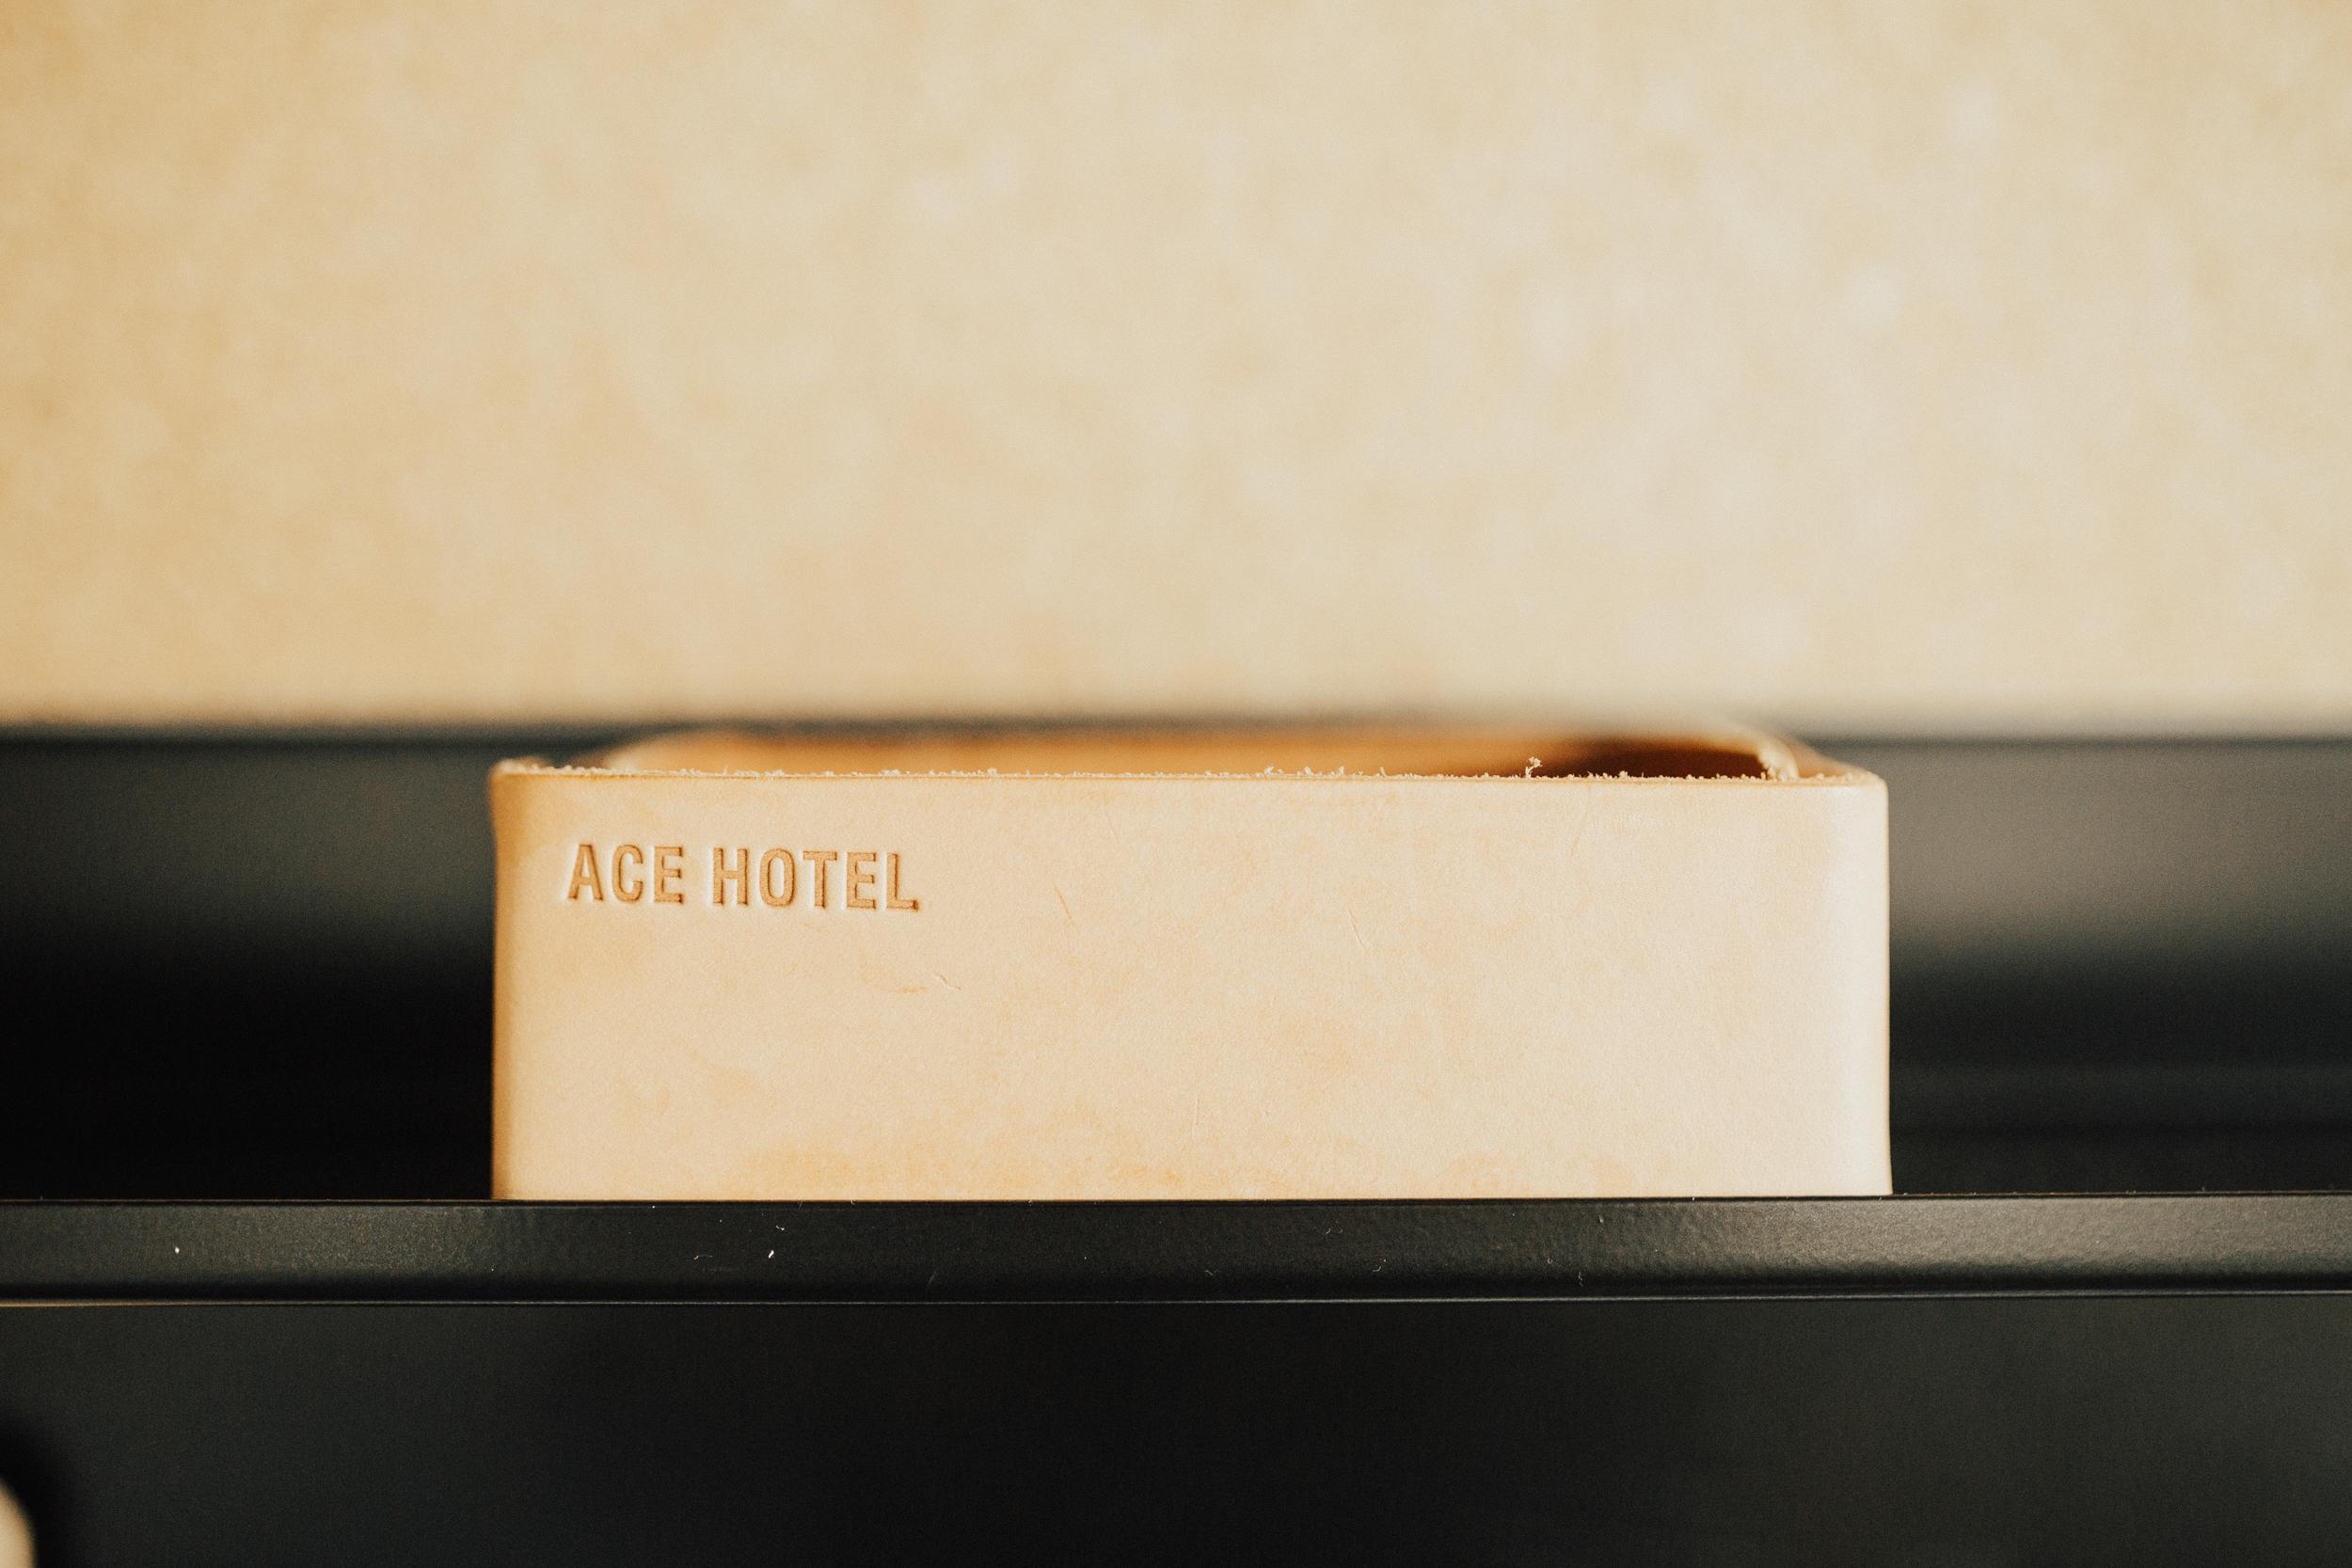 Laura-Benn-The-Asylum-London-The-Ace-Hotel-Wedding-Alternative-Darina-Stoda-Photography-5.jpg